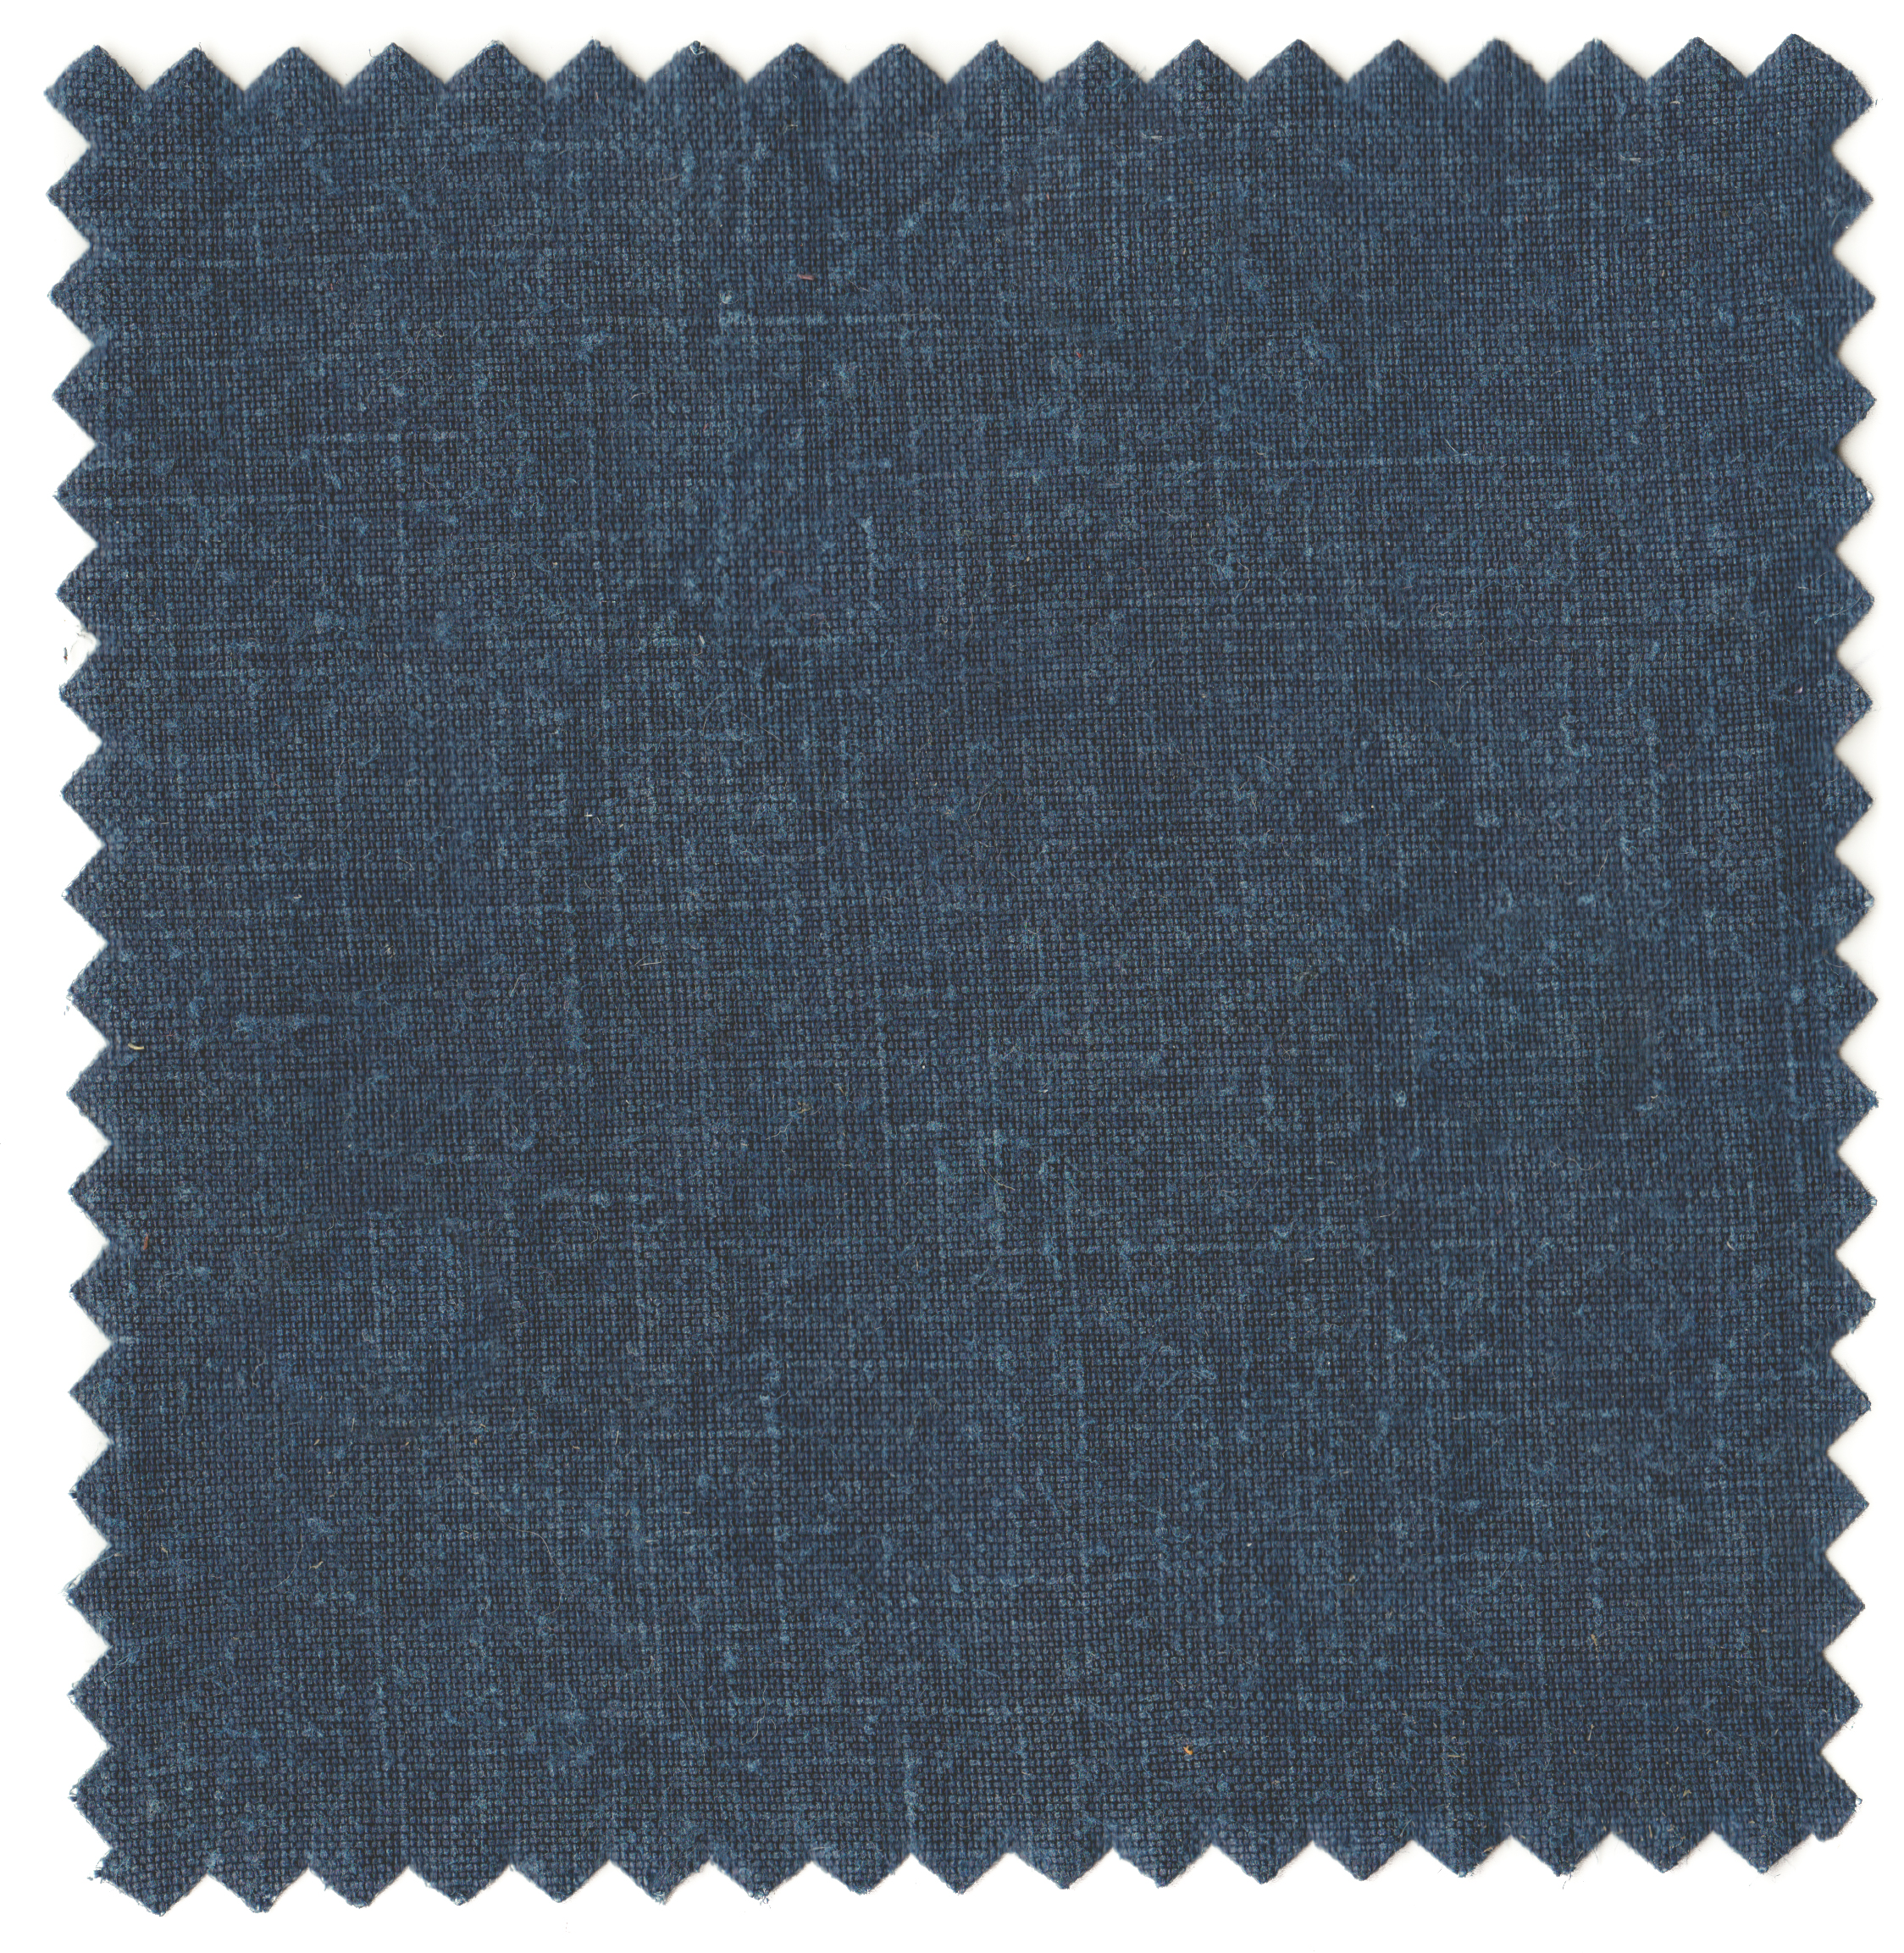 Indigo Blues-7.jpg